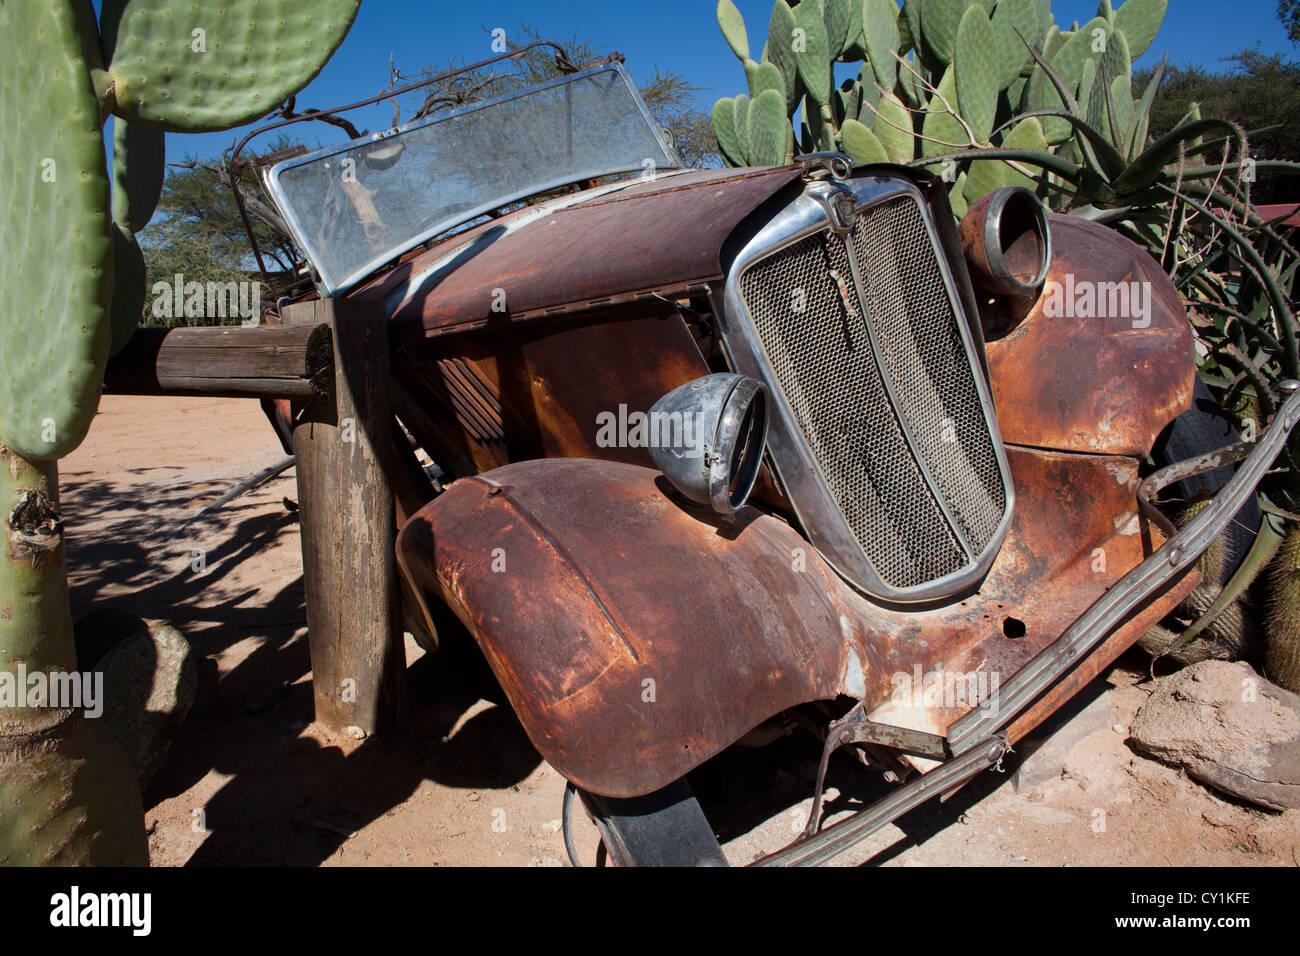 old car wreckage at solitair, namibia - Stock Image